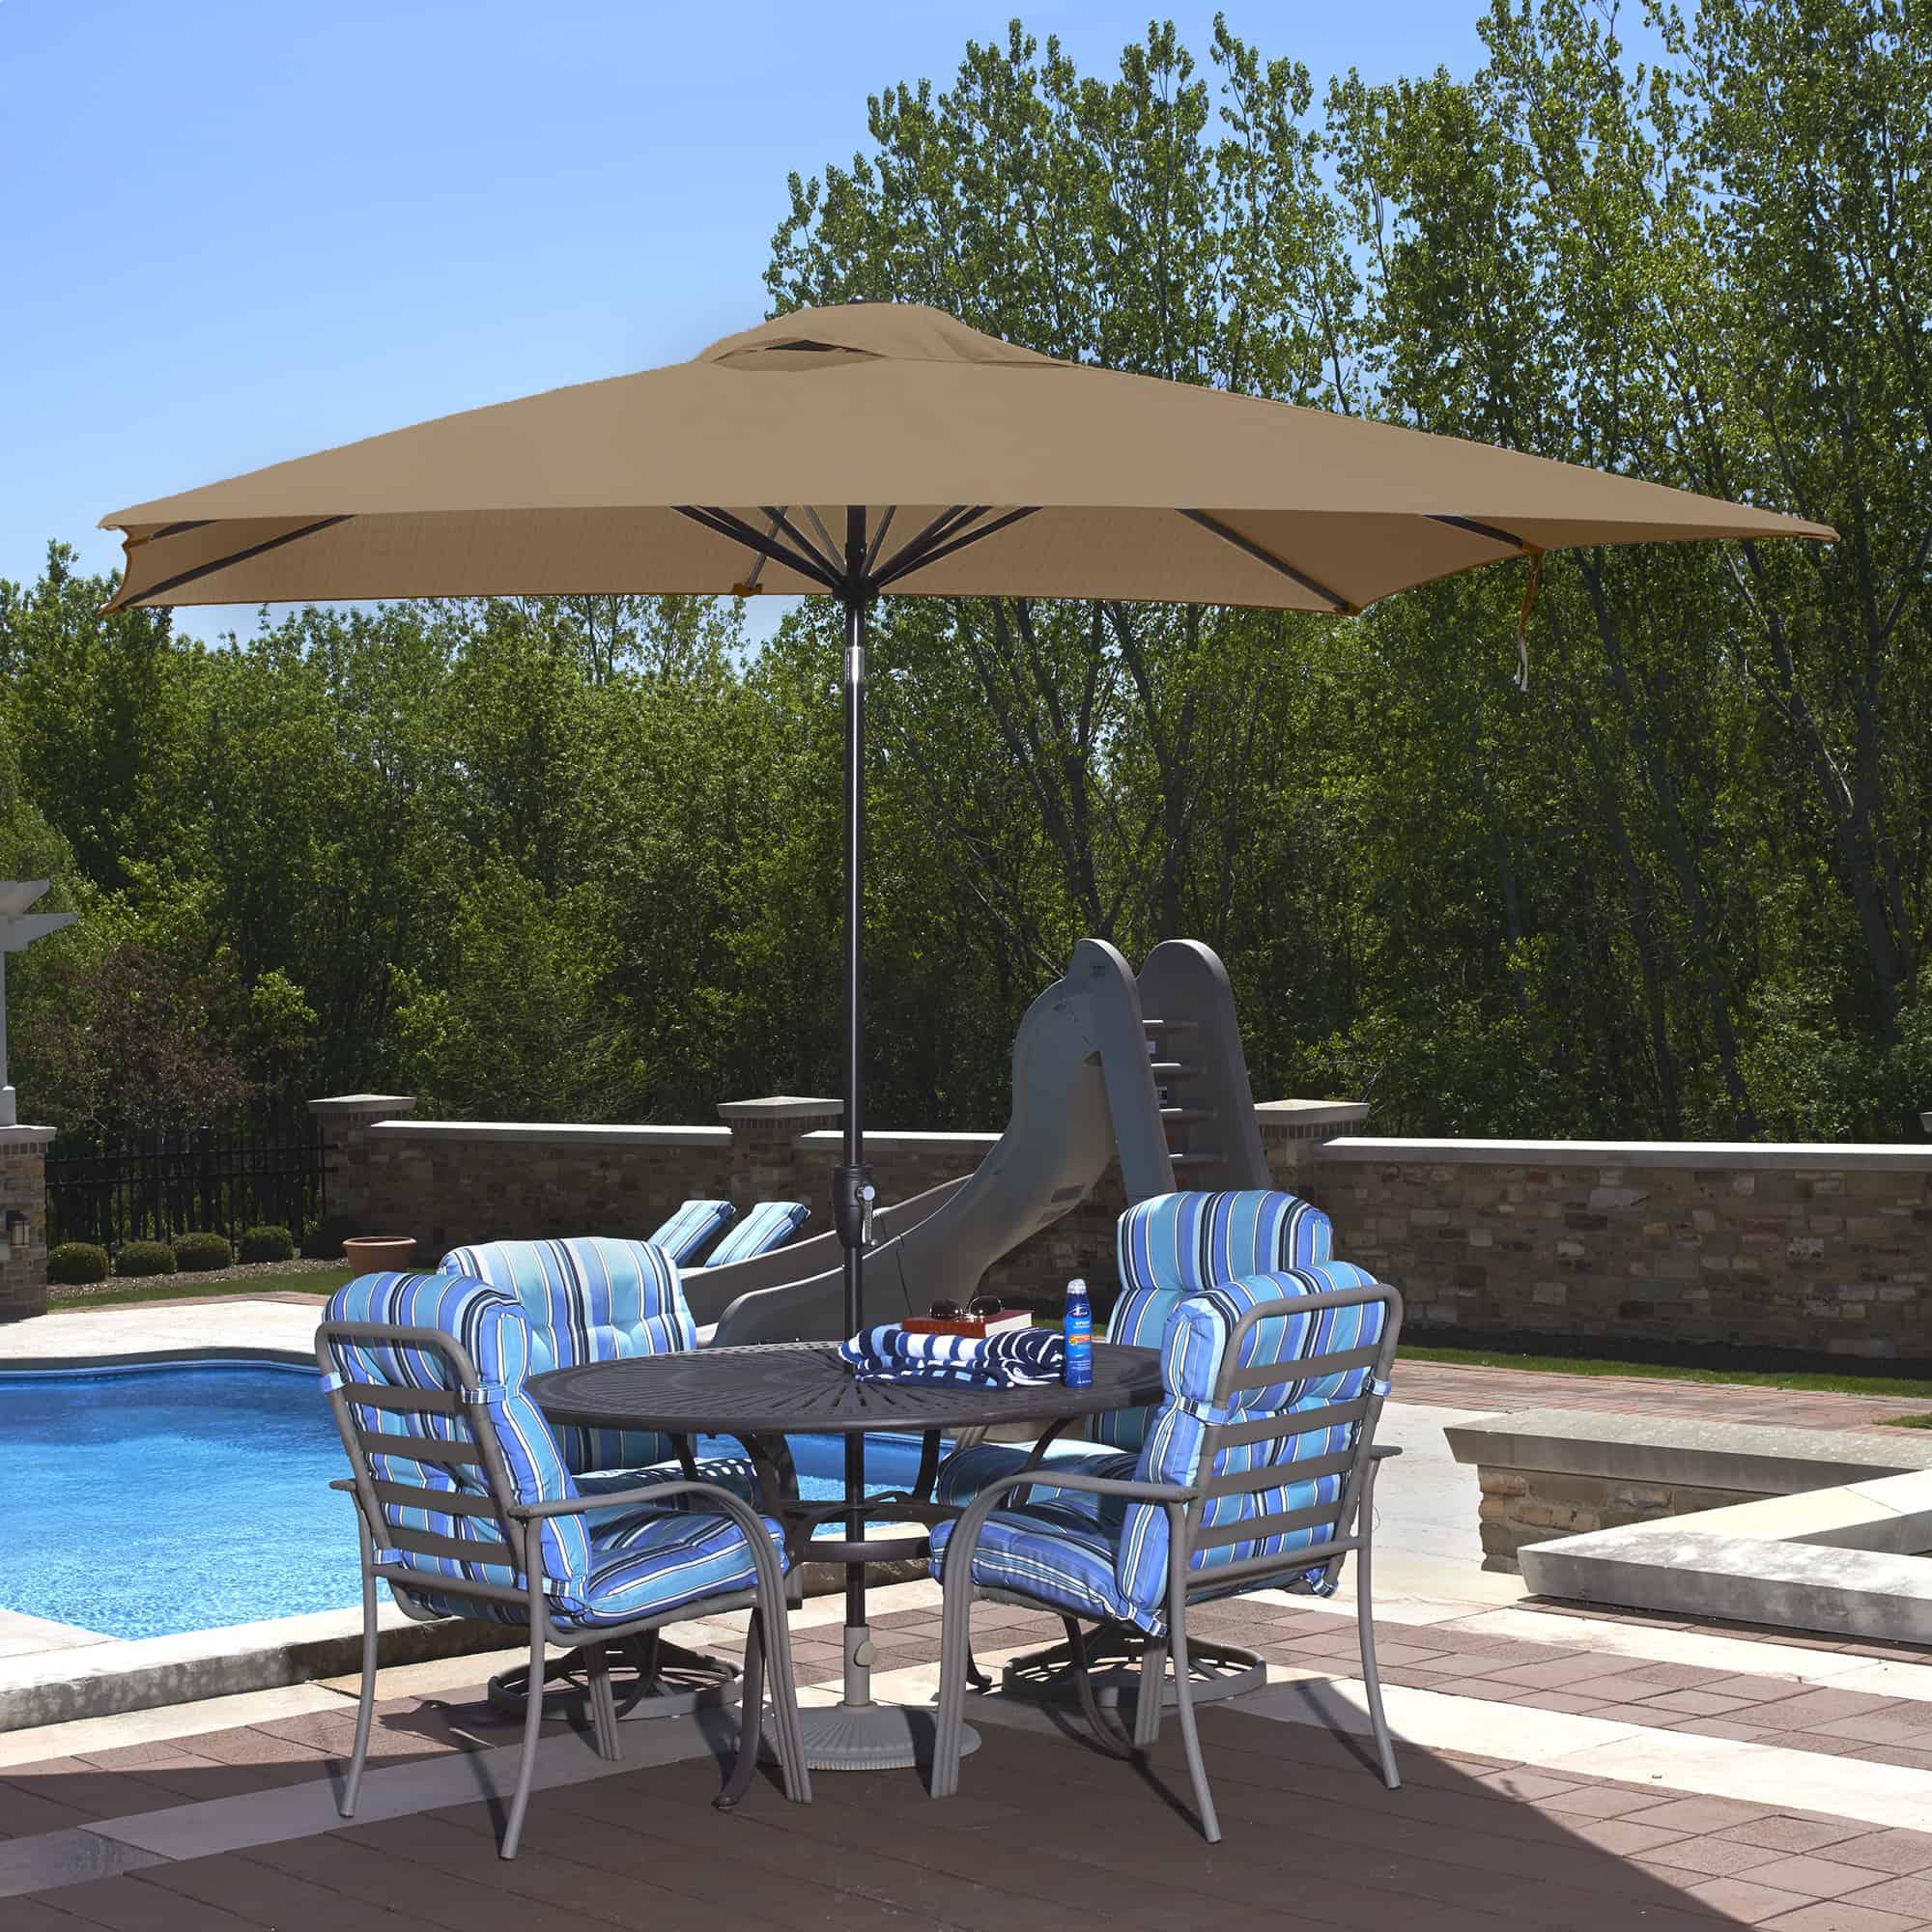 caspian 8 ft x 10 ft rectangular market umbrella with sunbrella canopy pool warehouse